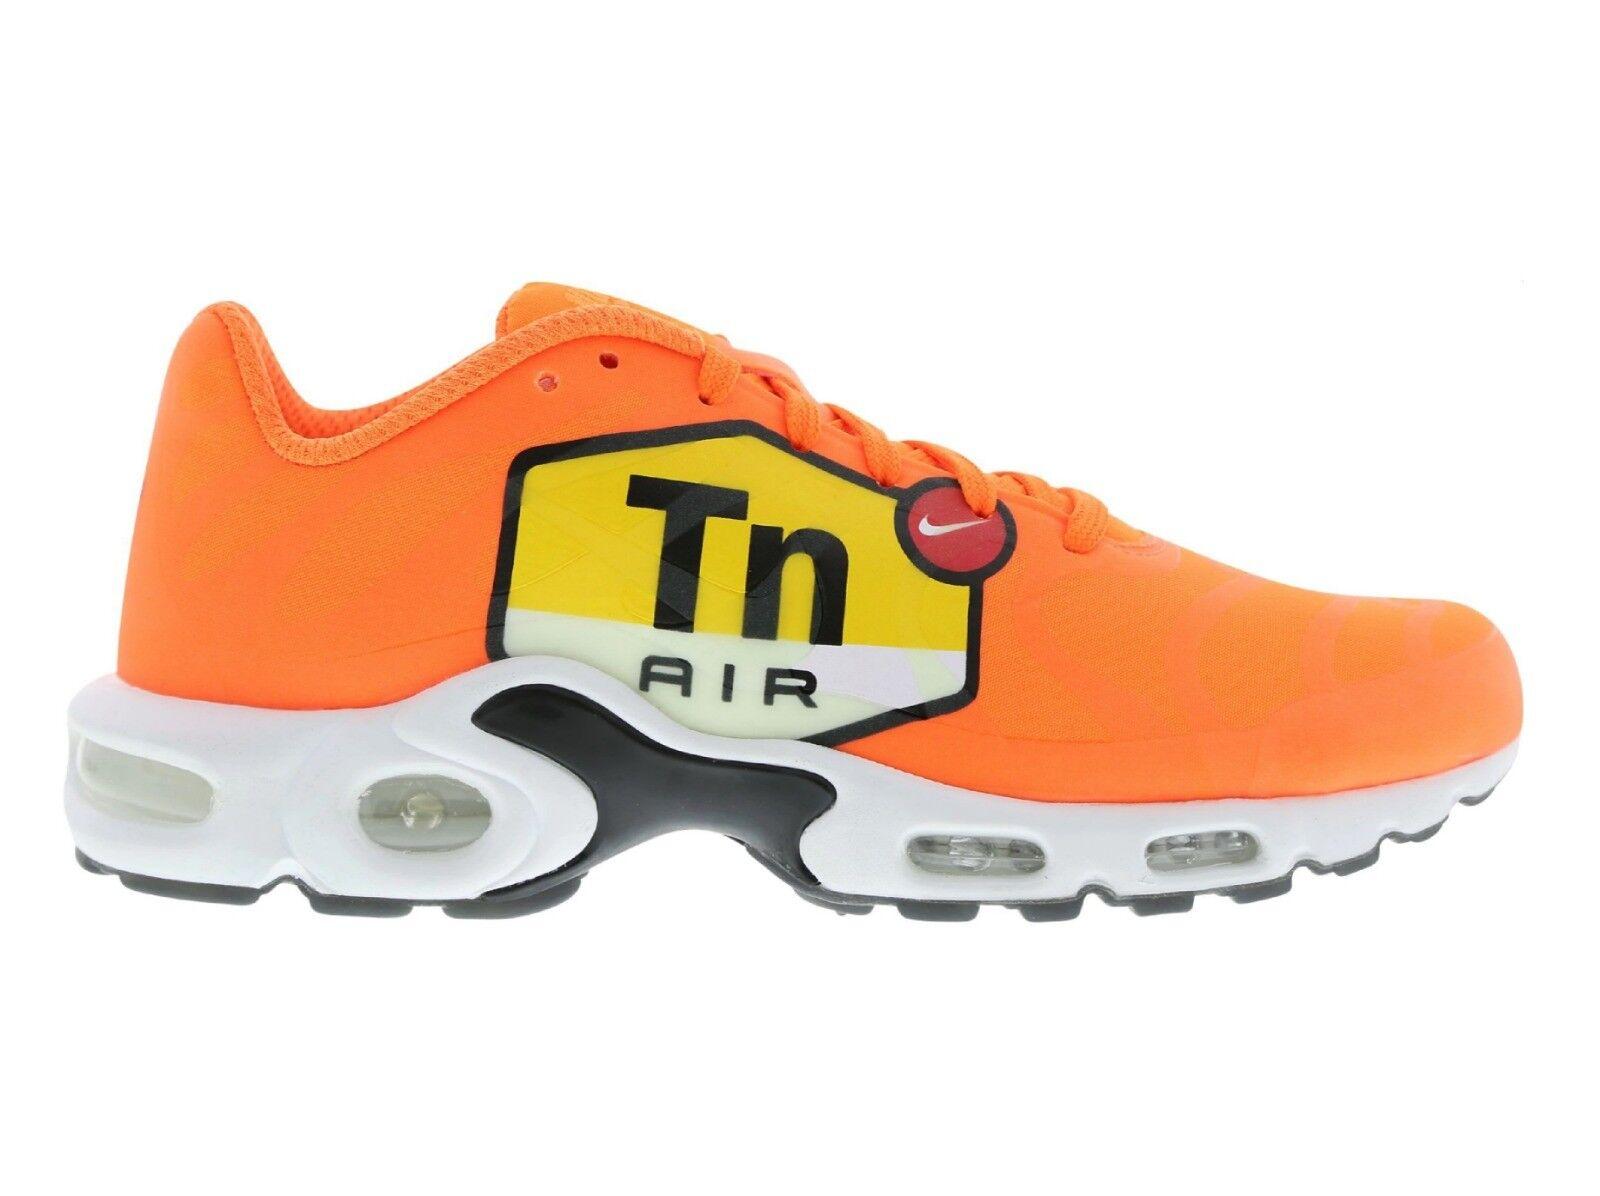 Nike Air Max Plus ns GPX Tuned Air Hombre - Corriendo trainer Zapatos / - Hombre nuevo corrido 62803c